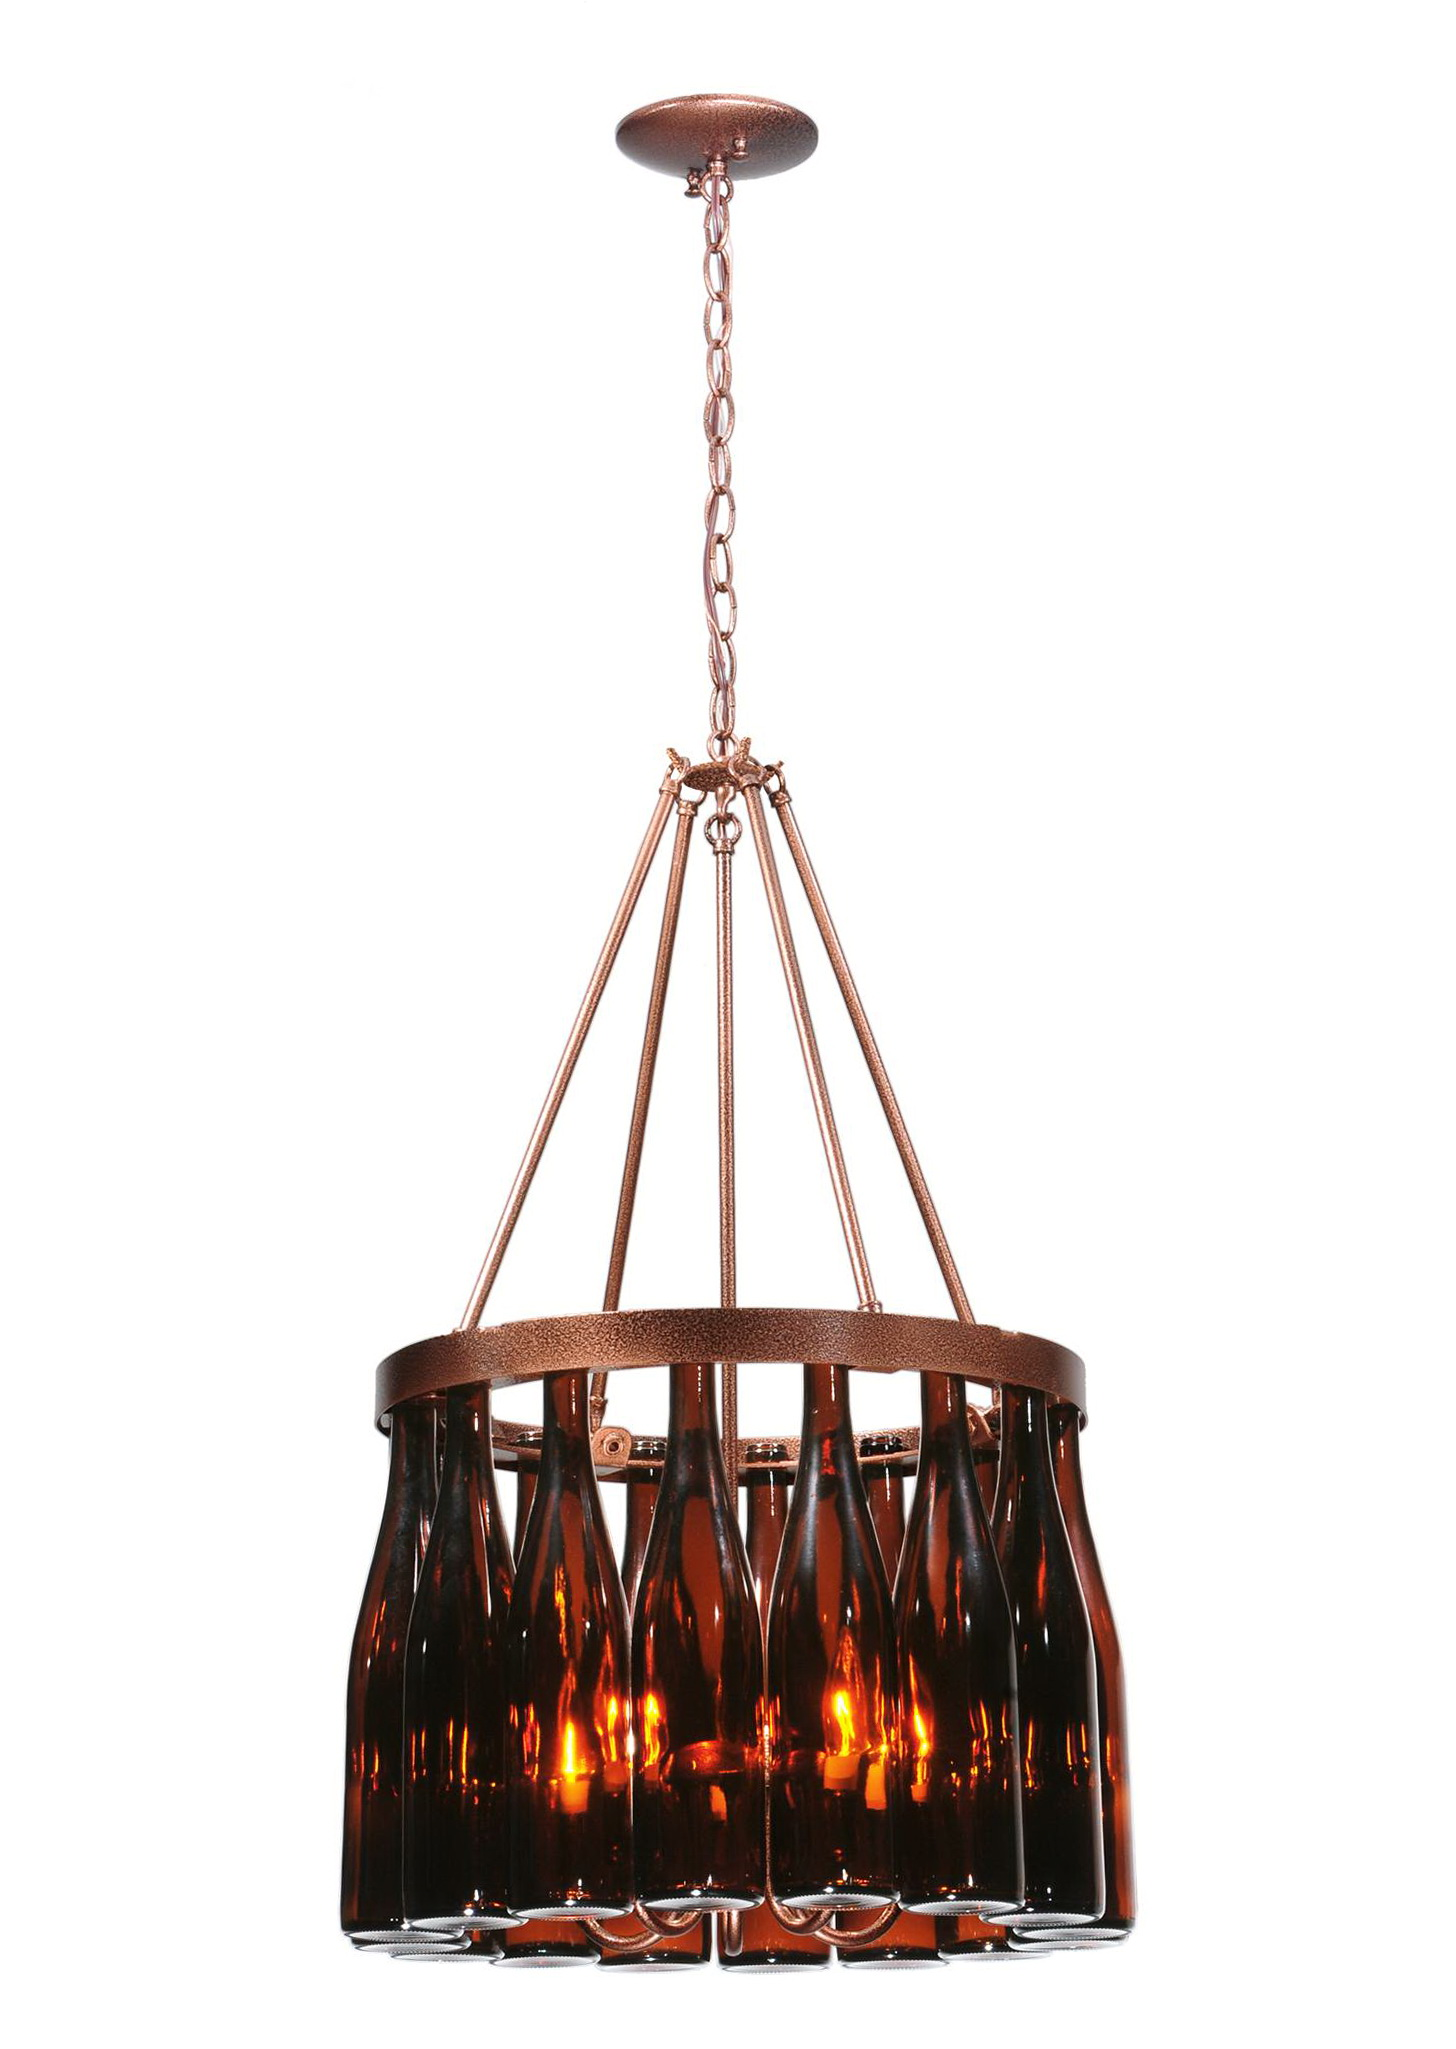 Wine bottle chandelier for sale home design ideas - Chandelier for sale ...